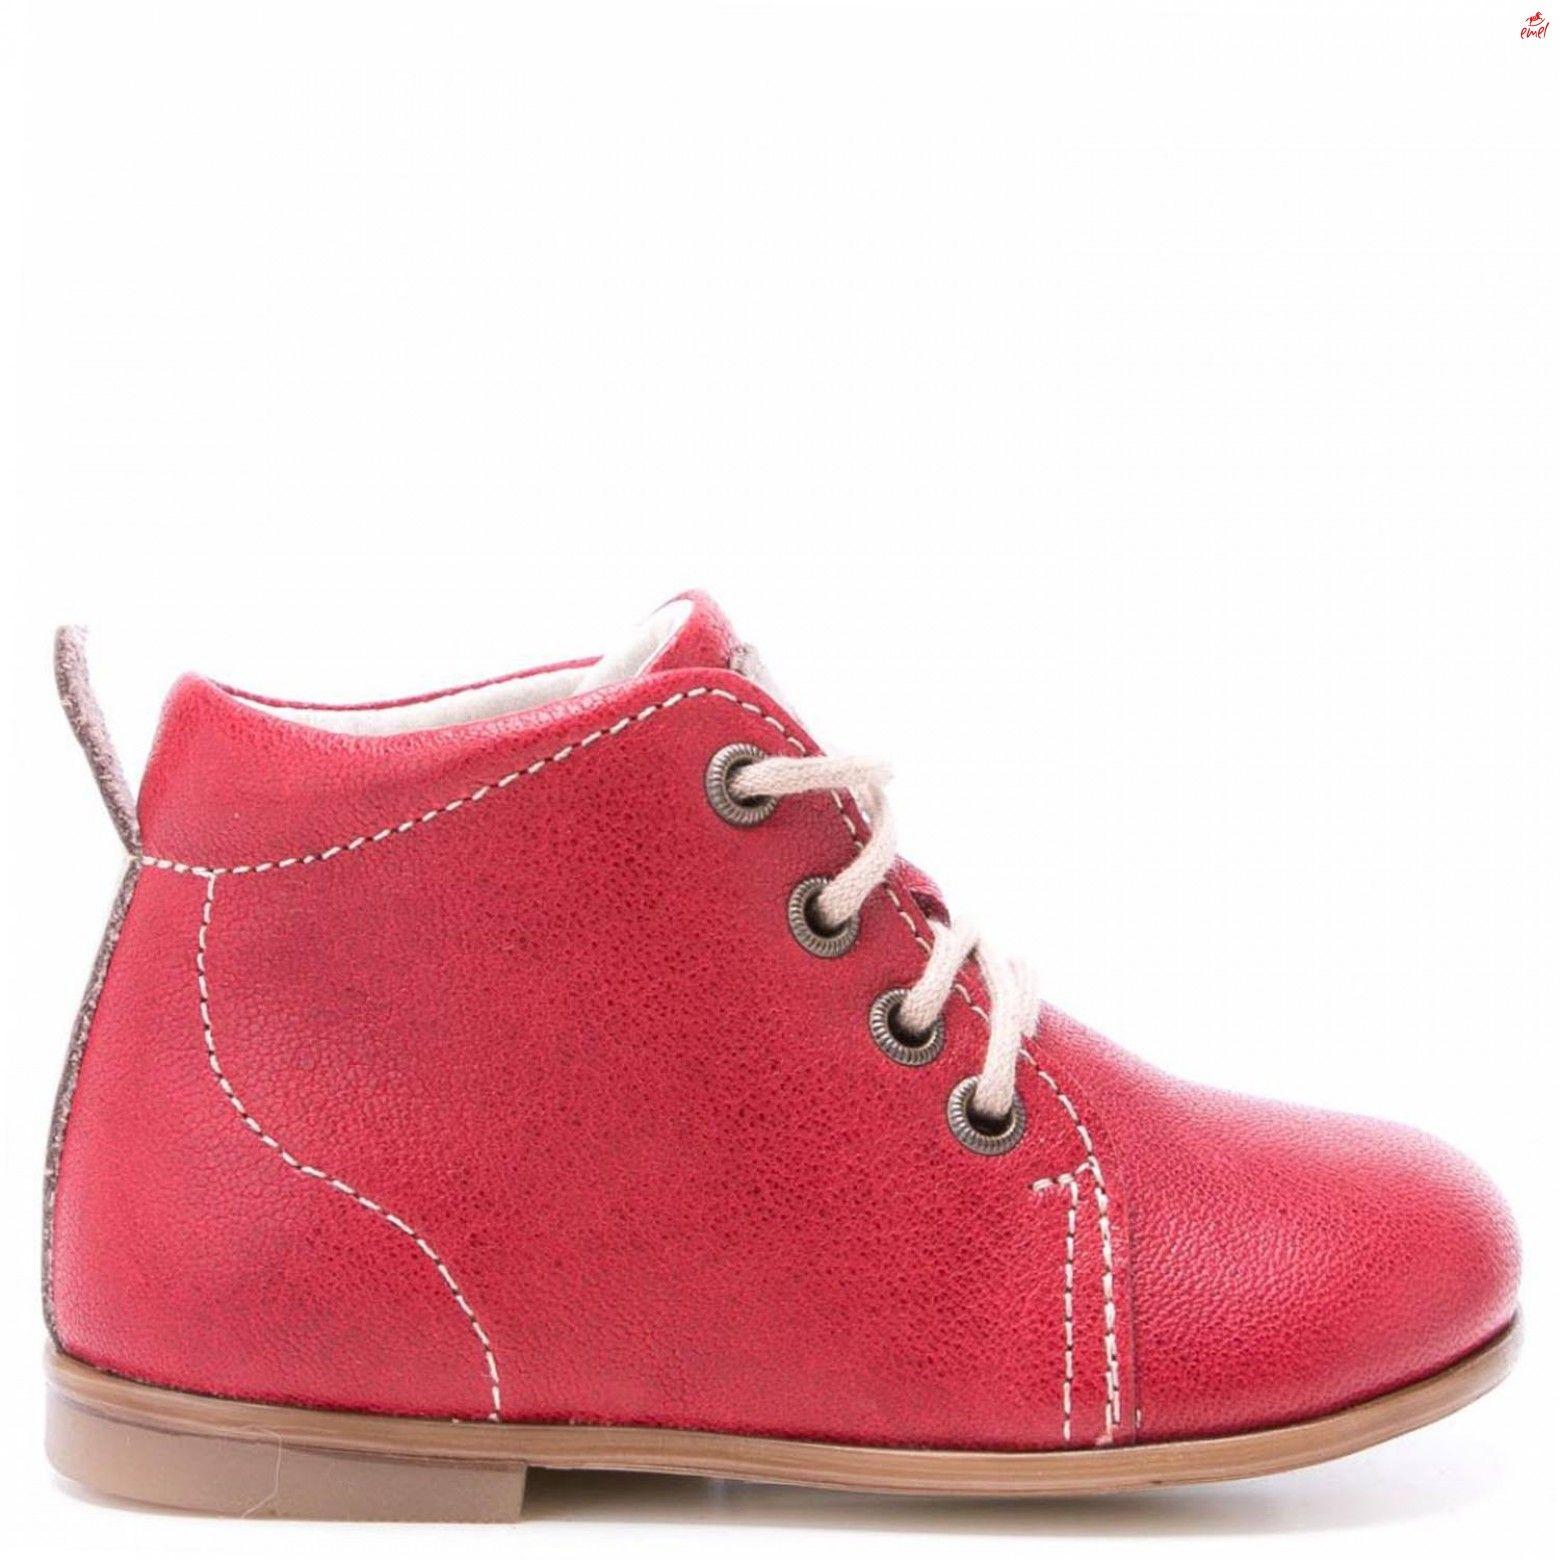 Emel Polski Producent Obuwia Dla Dzieci Children Shoes Chukka Boots Top Sneakers